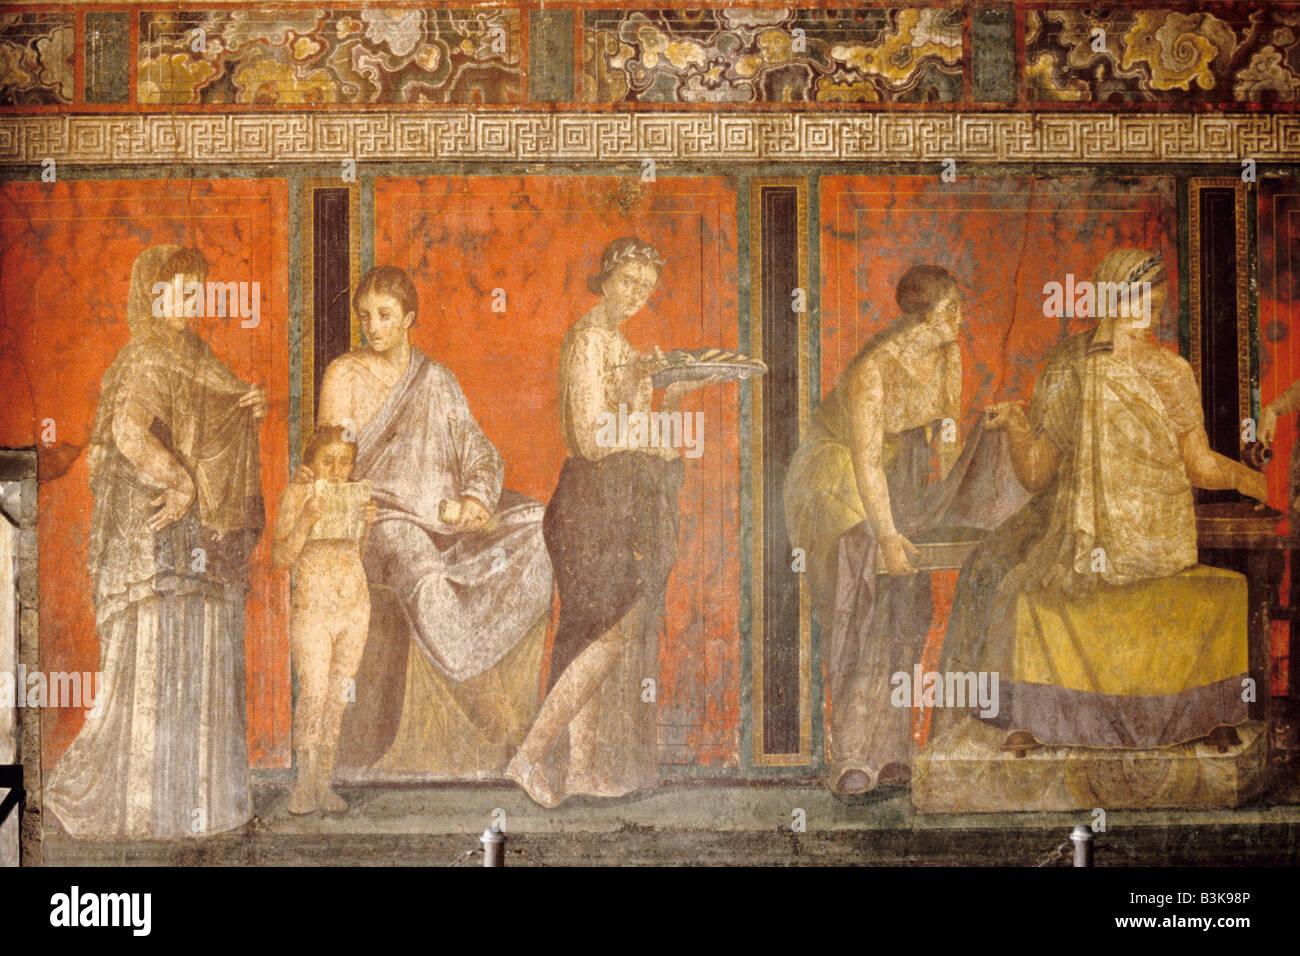 Pompei. Italy. Frescoes in the Villa dei Misteri, (Villa of the Mysteries) Pompeii archaeological site - Stock Image